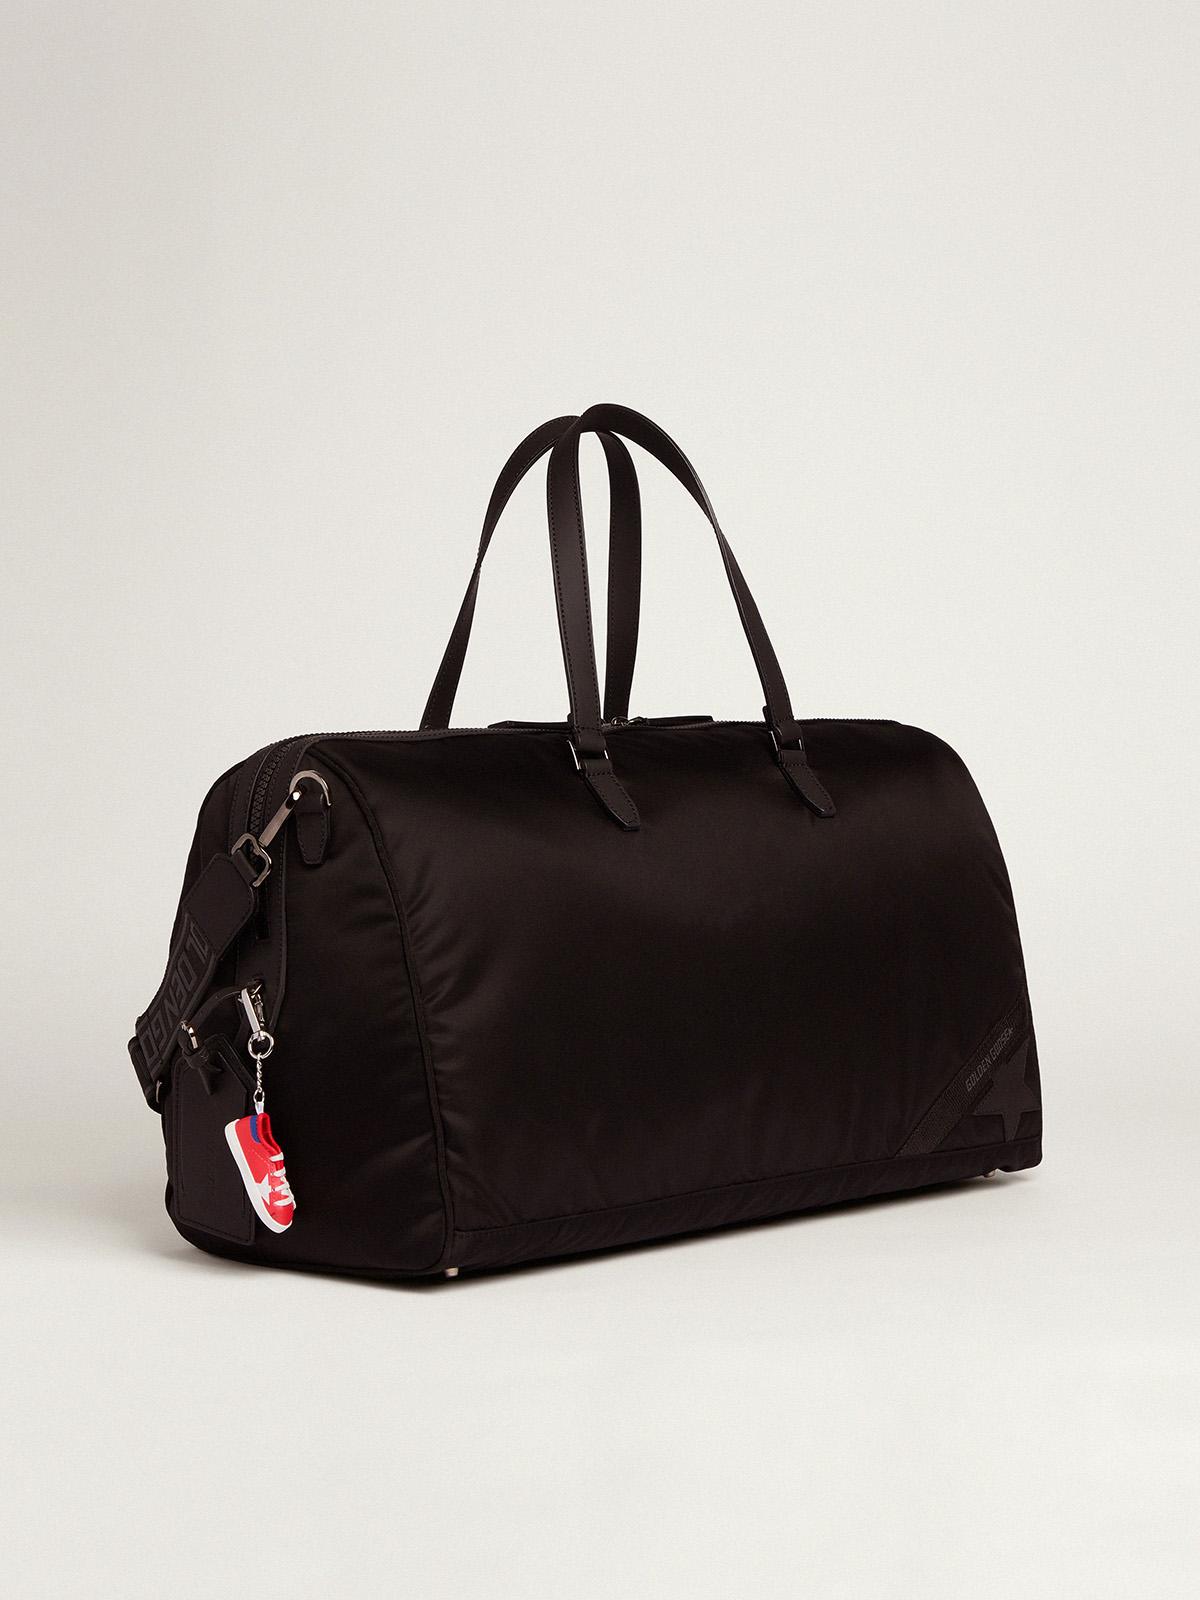 Golden Goose - Journey Duffle Bag in black nylon in